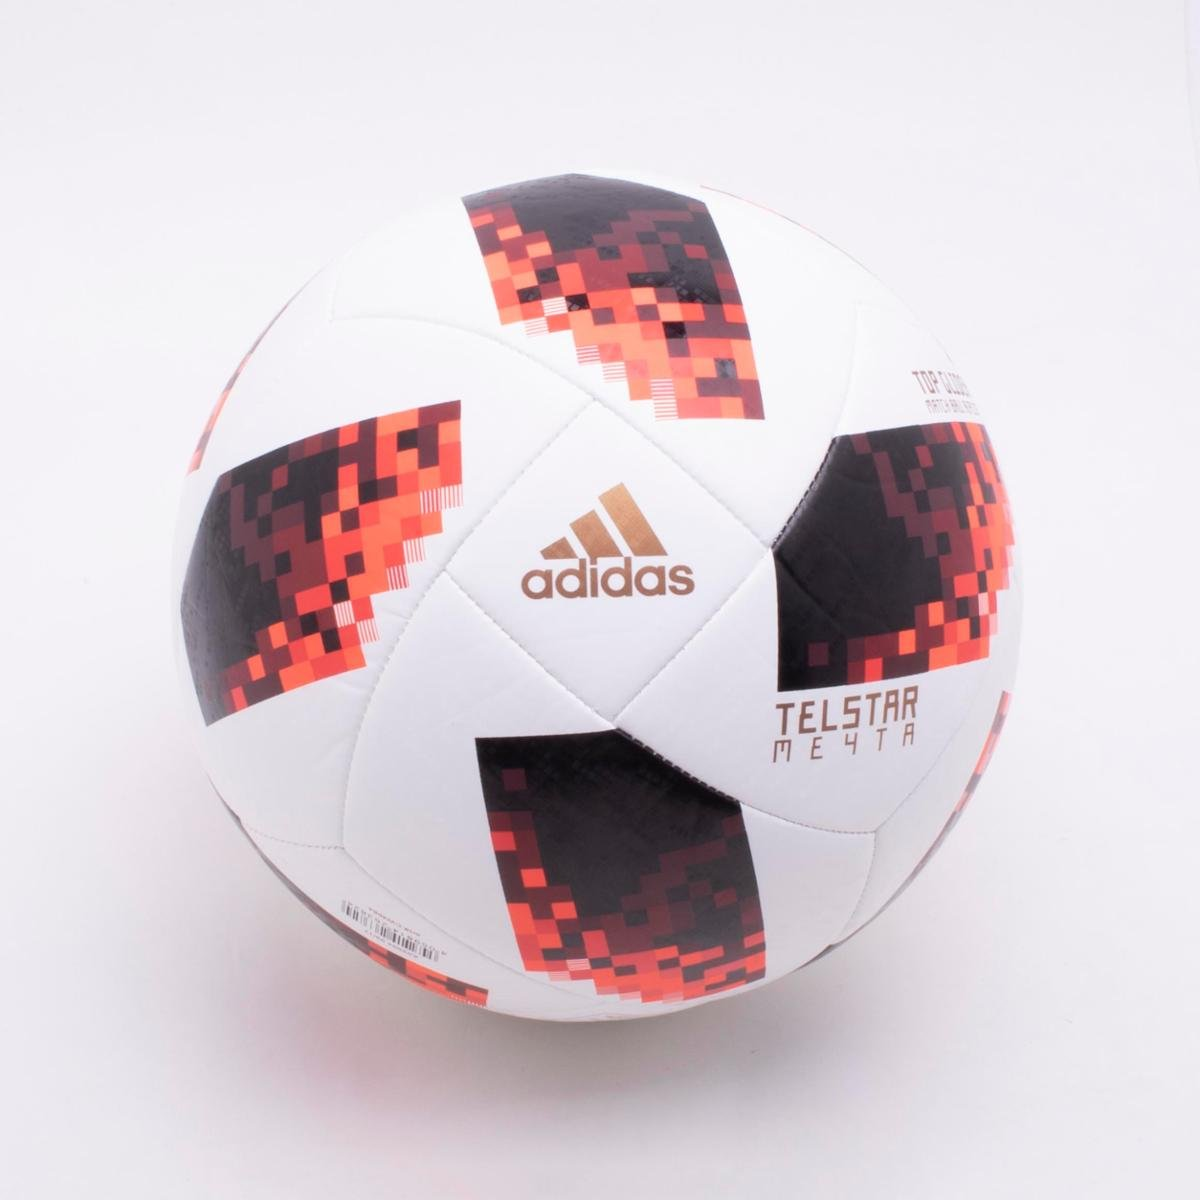 Bola de Futebol Campo Adidas Telstar 18 Top Glider Réplica Mata-Mata Copa  do Mundo ... f573117469c3c